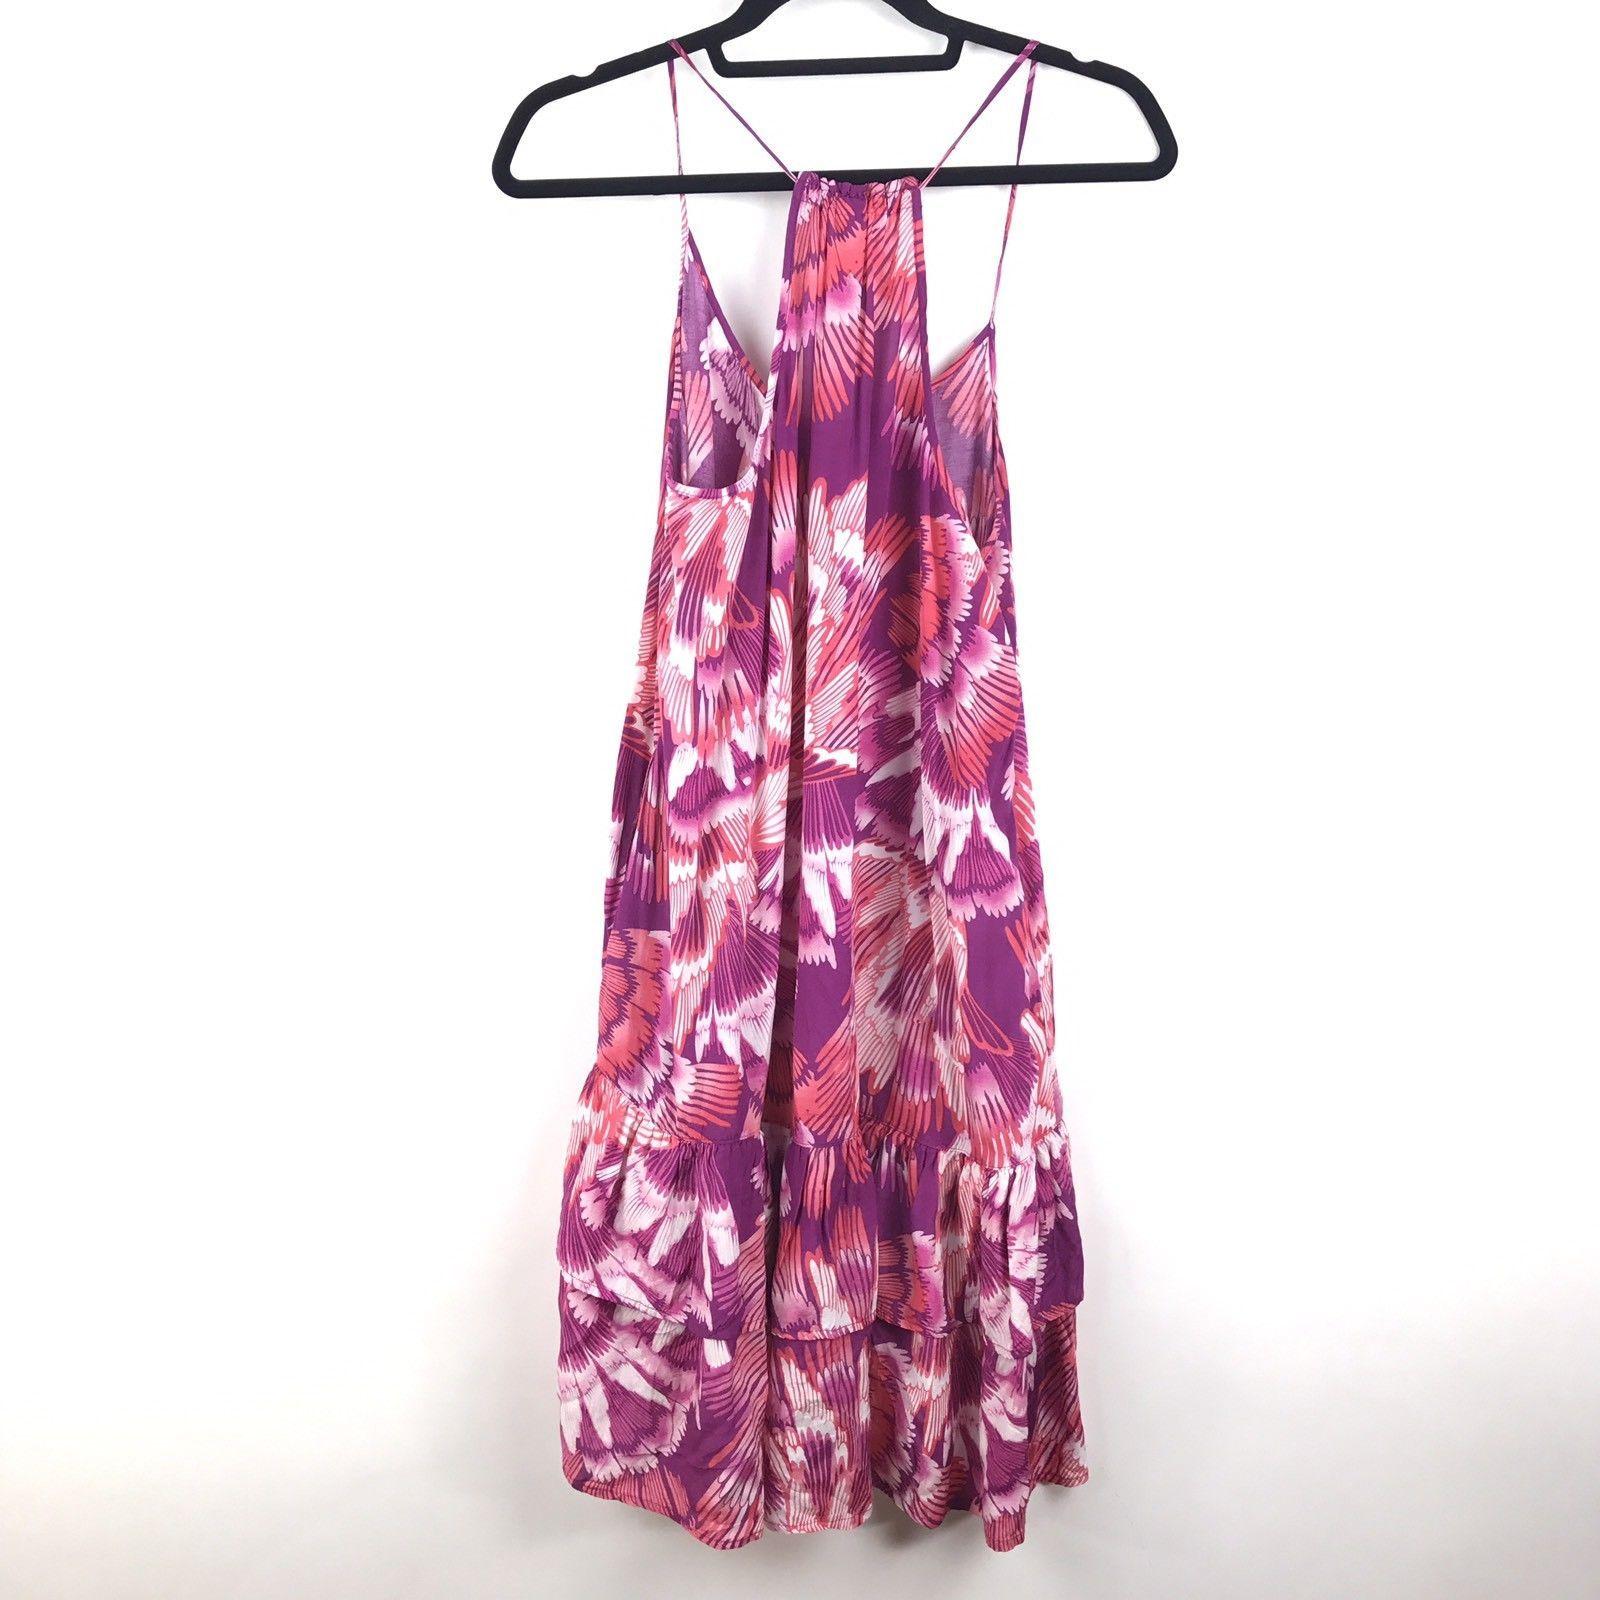 Free People Ruffle Hem Slip Dress Size Small Pink Floral Drop Waist Racerback